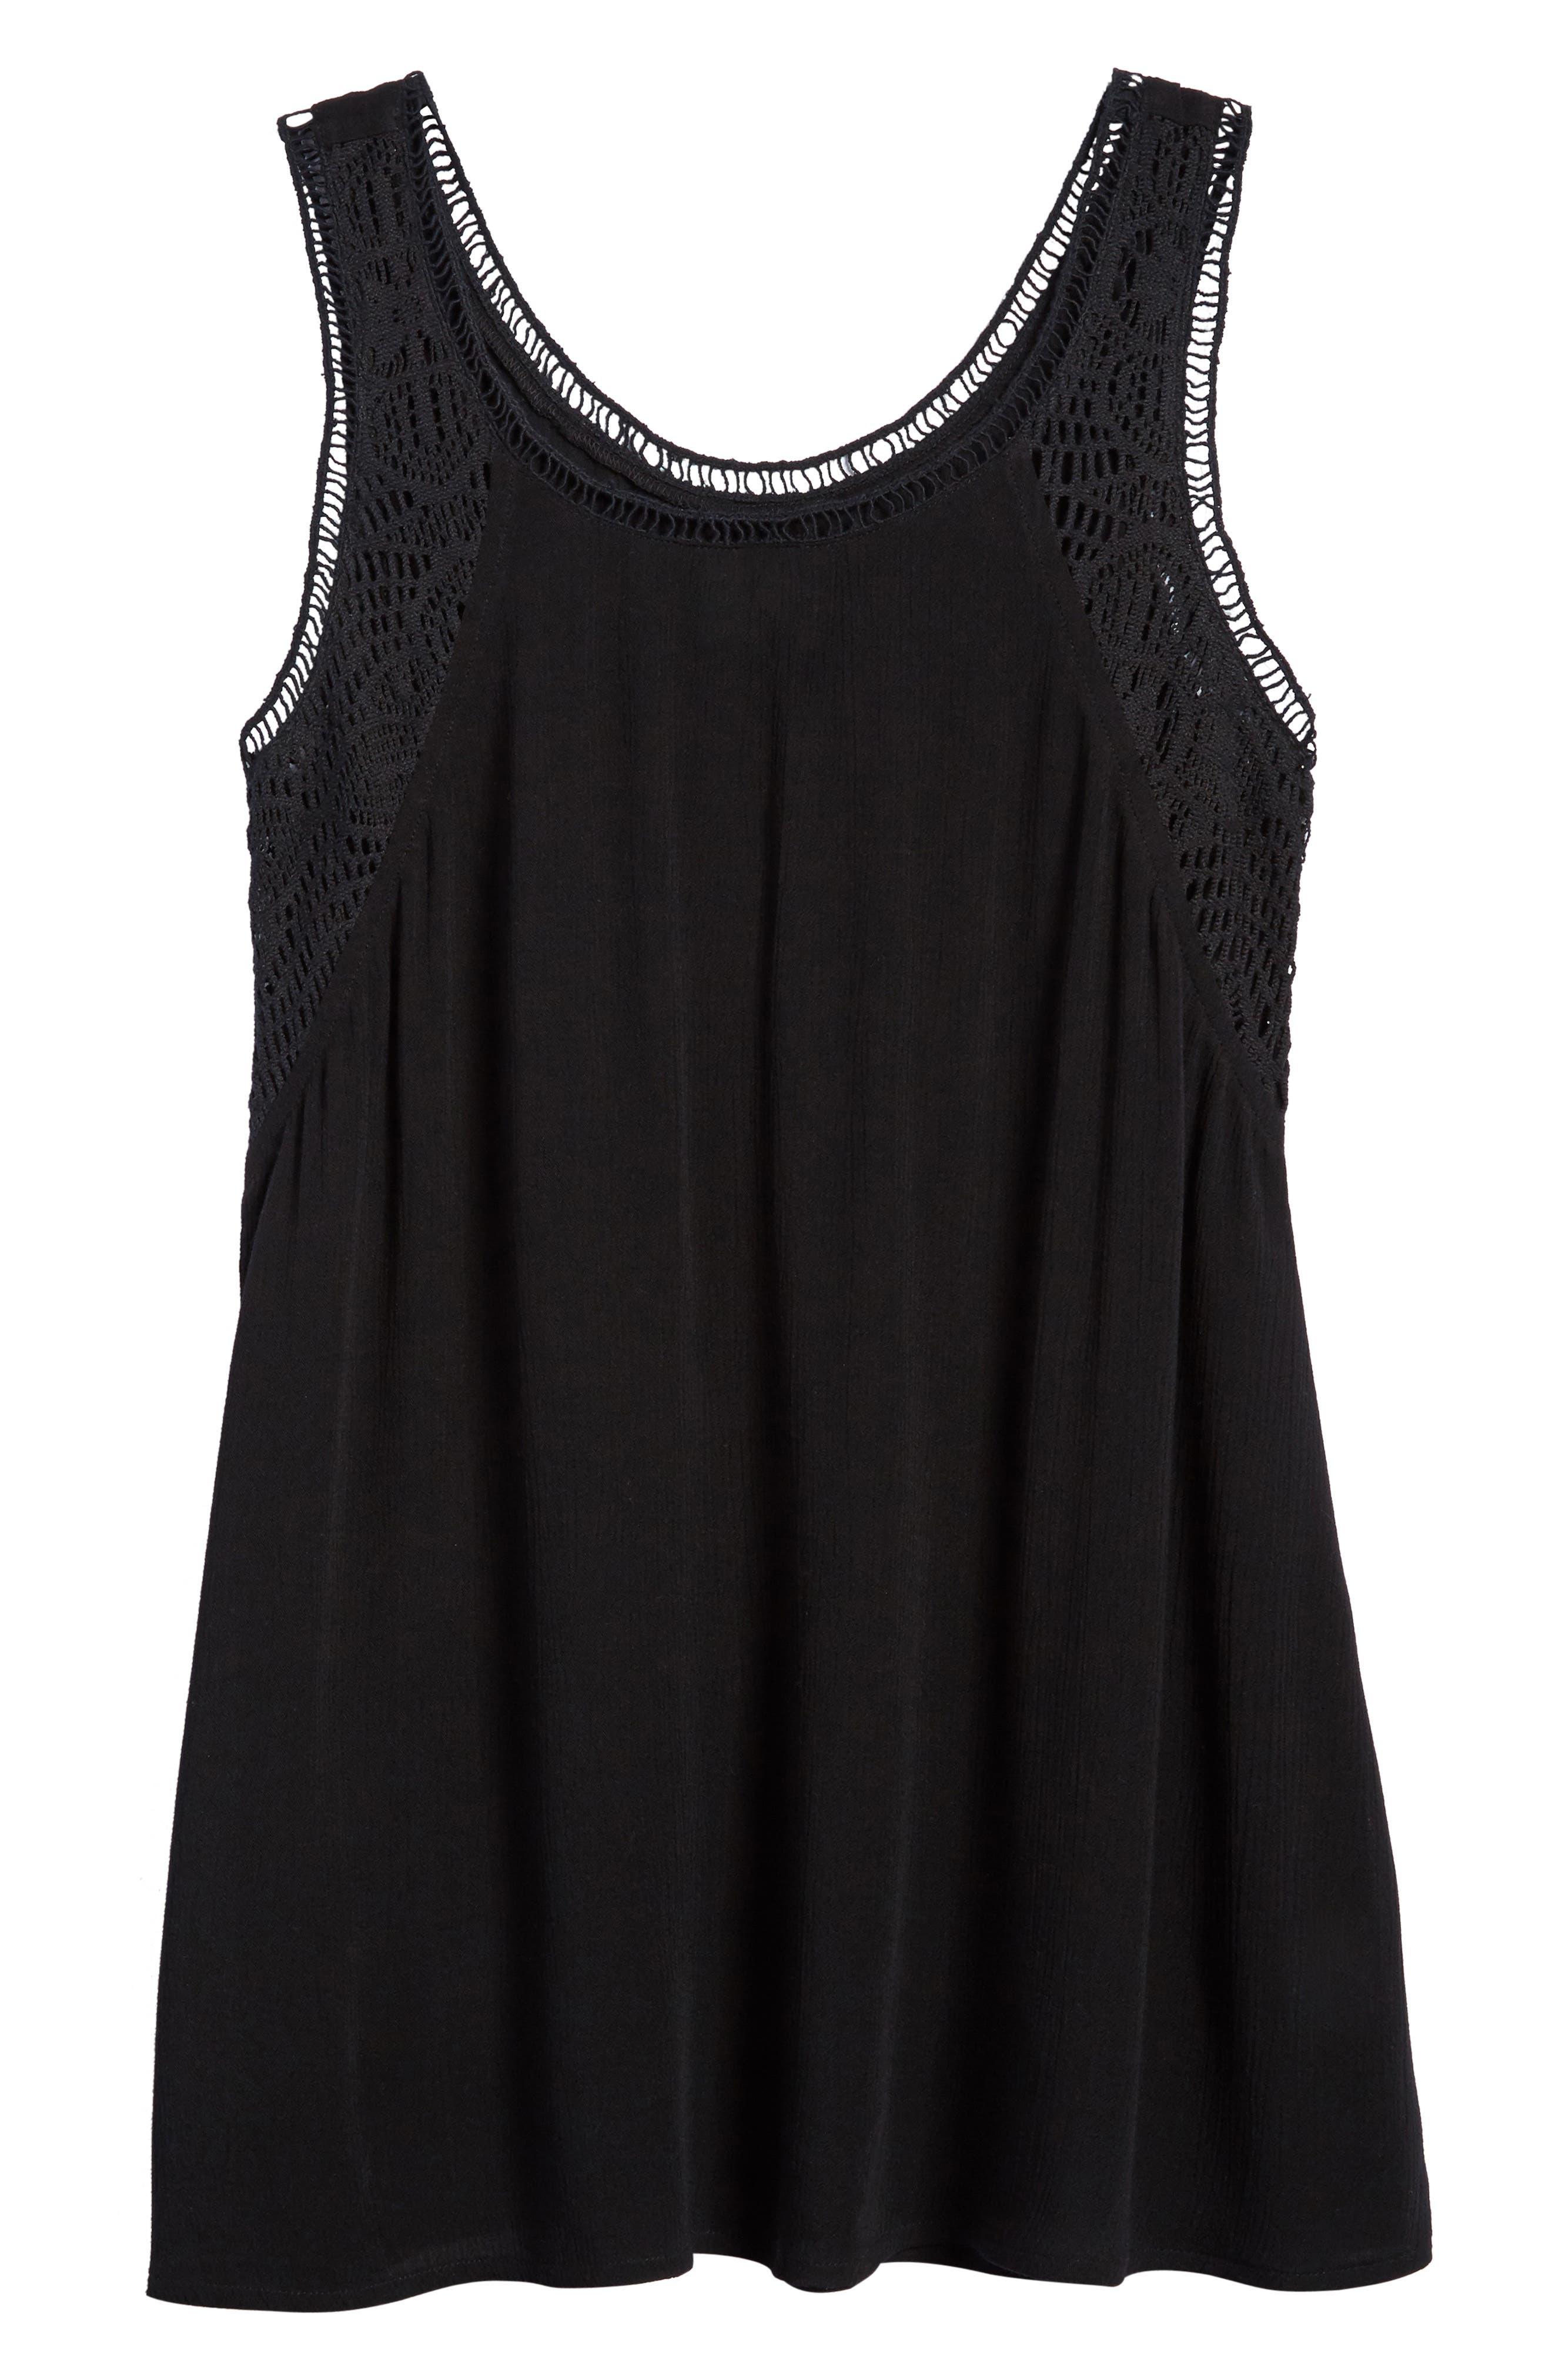 Addilyn Crochet Cover-Up Dress,                         Main,                         color, Black - Blk